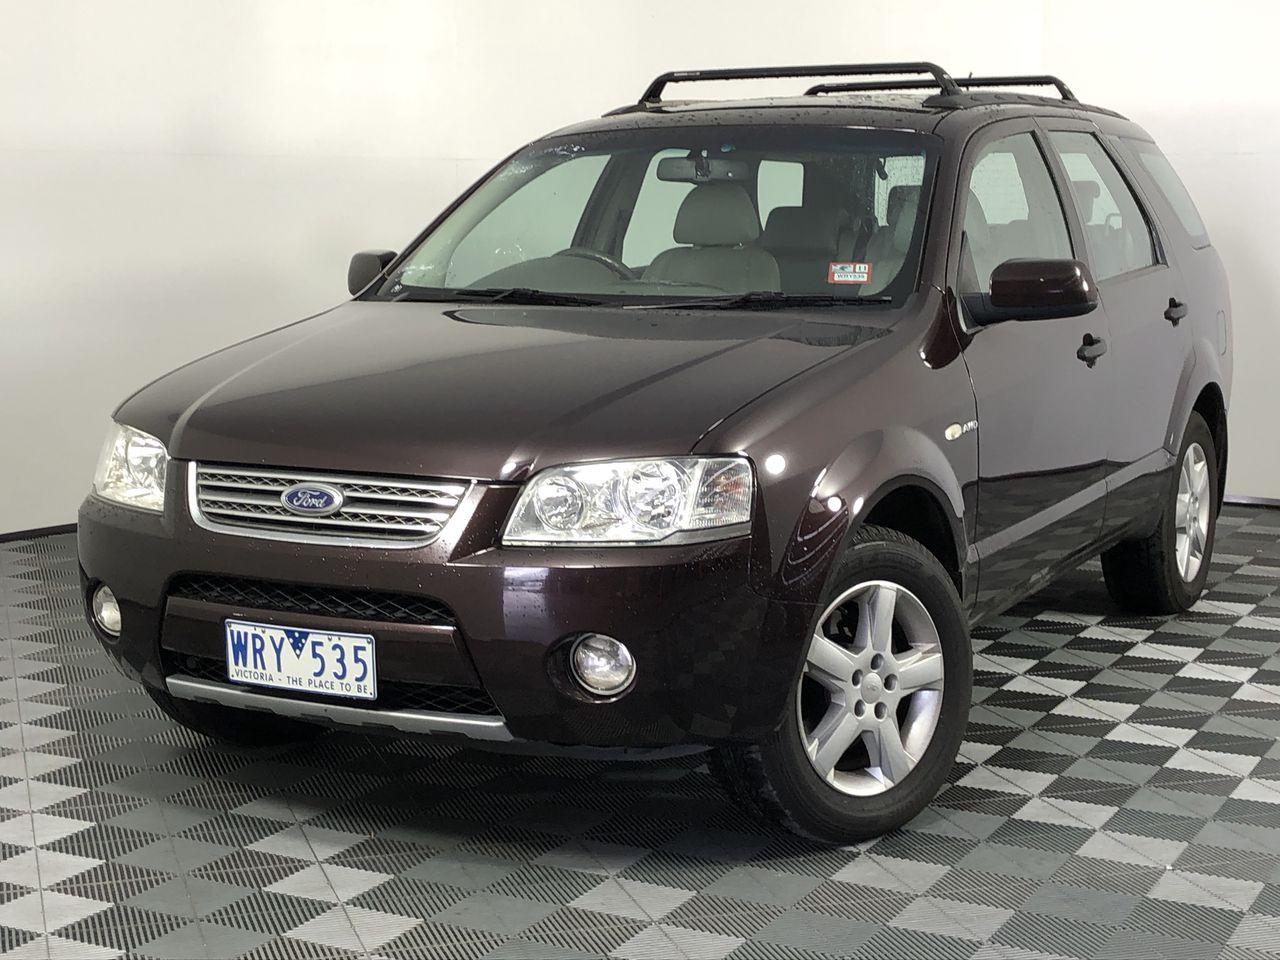 2008 Ford Territory Ghia (4x4) SY Automatic 7 Seats Wagon